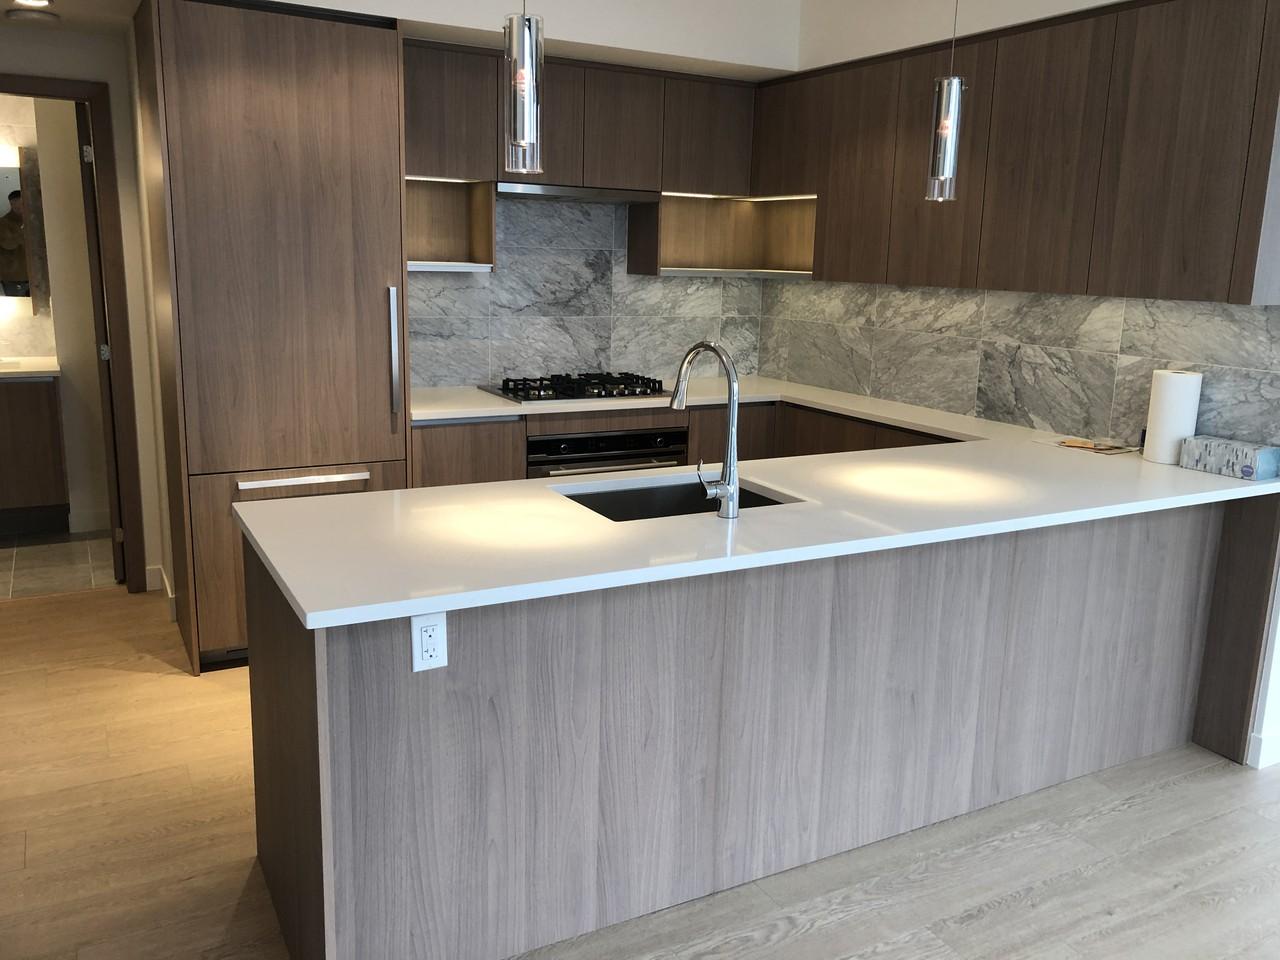 concord gardens richmond condo for rent 2 bedroom kitchen